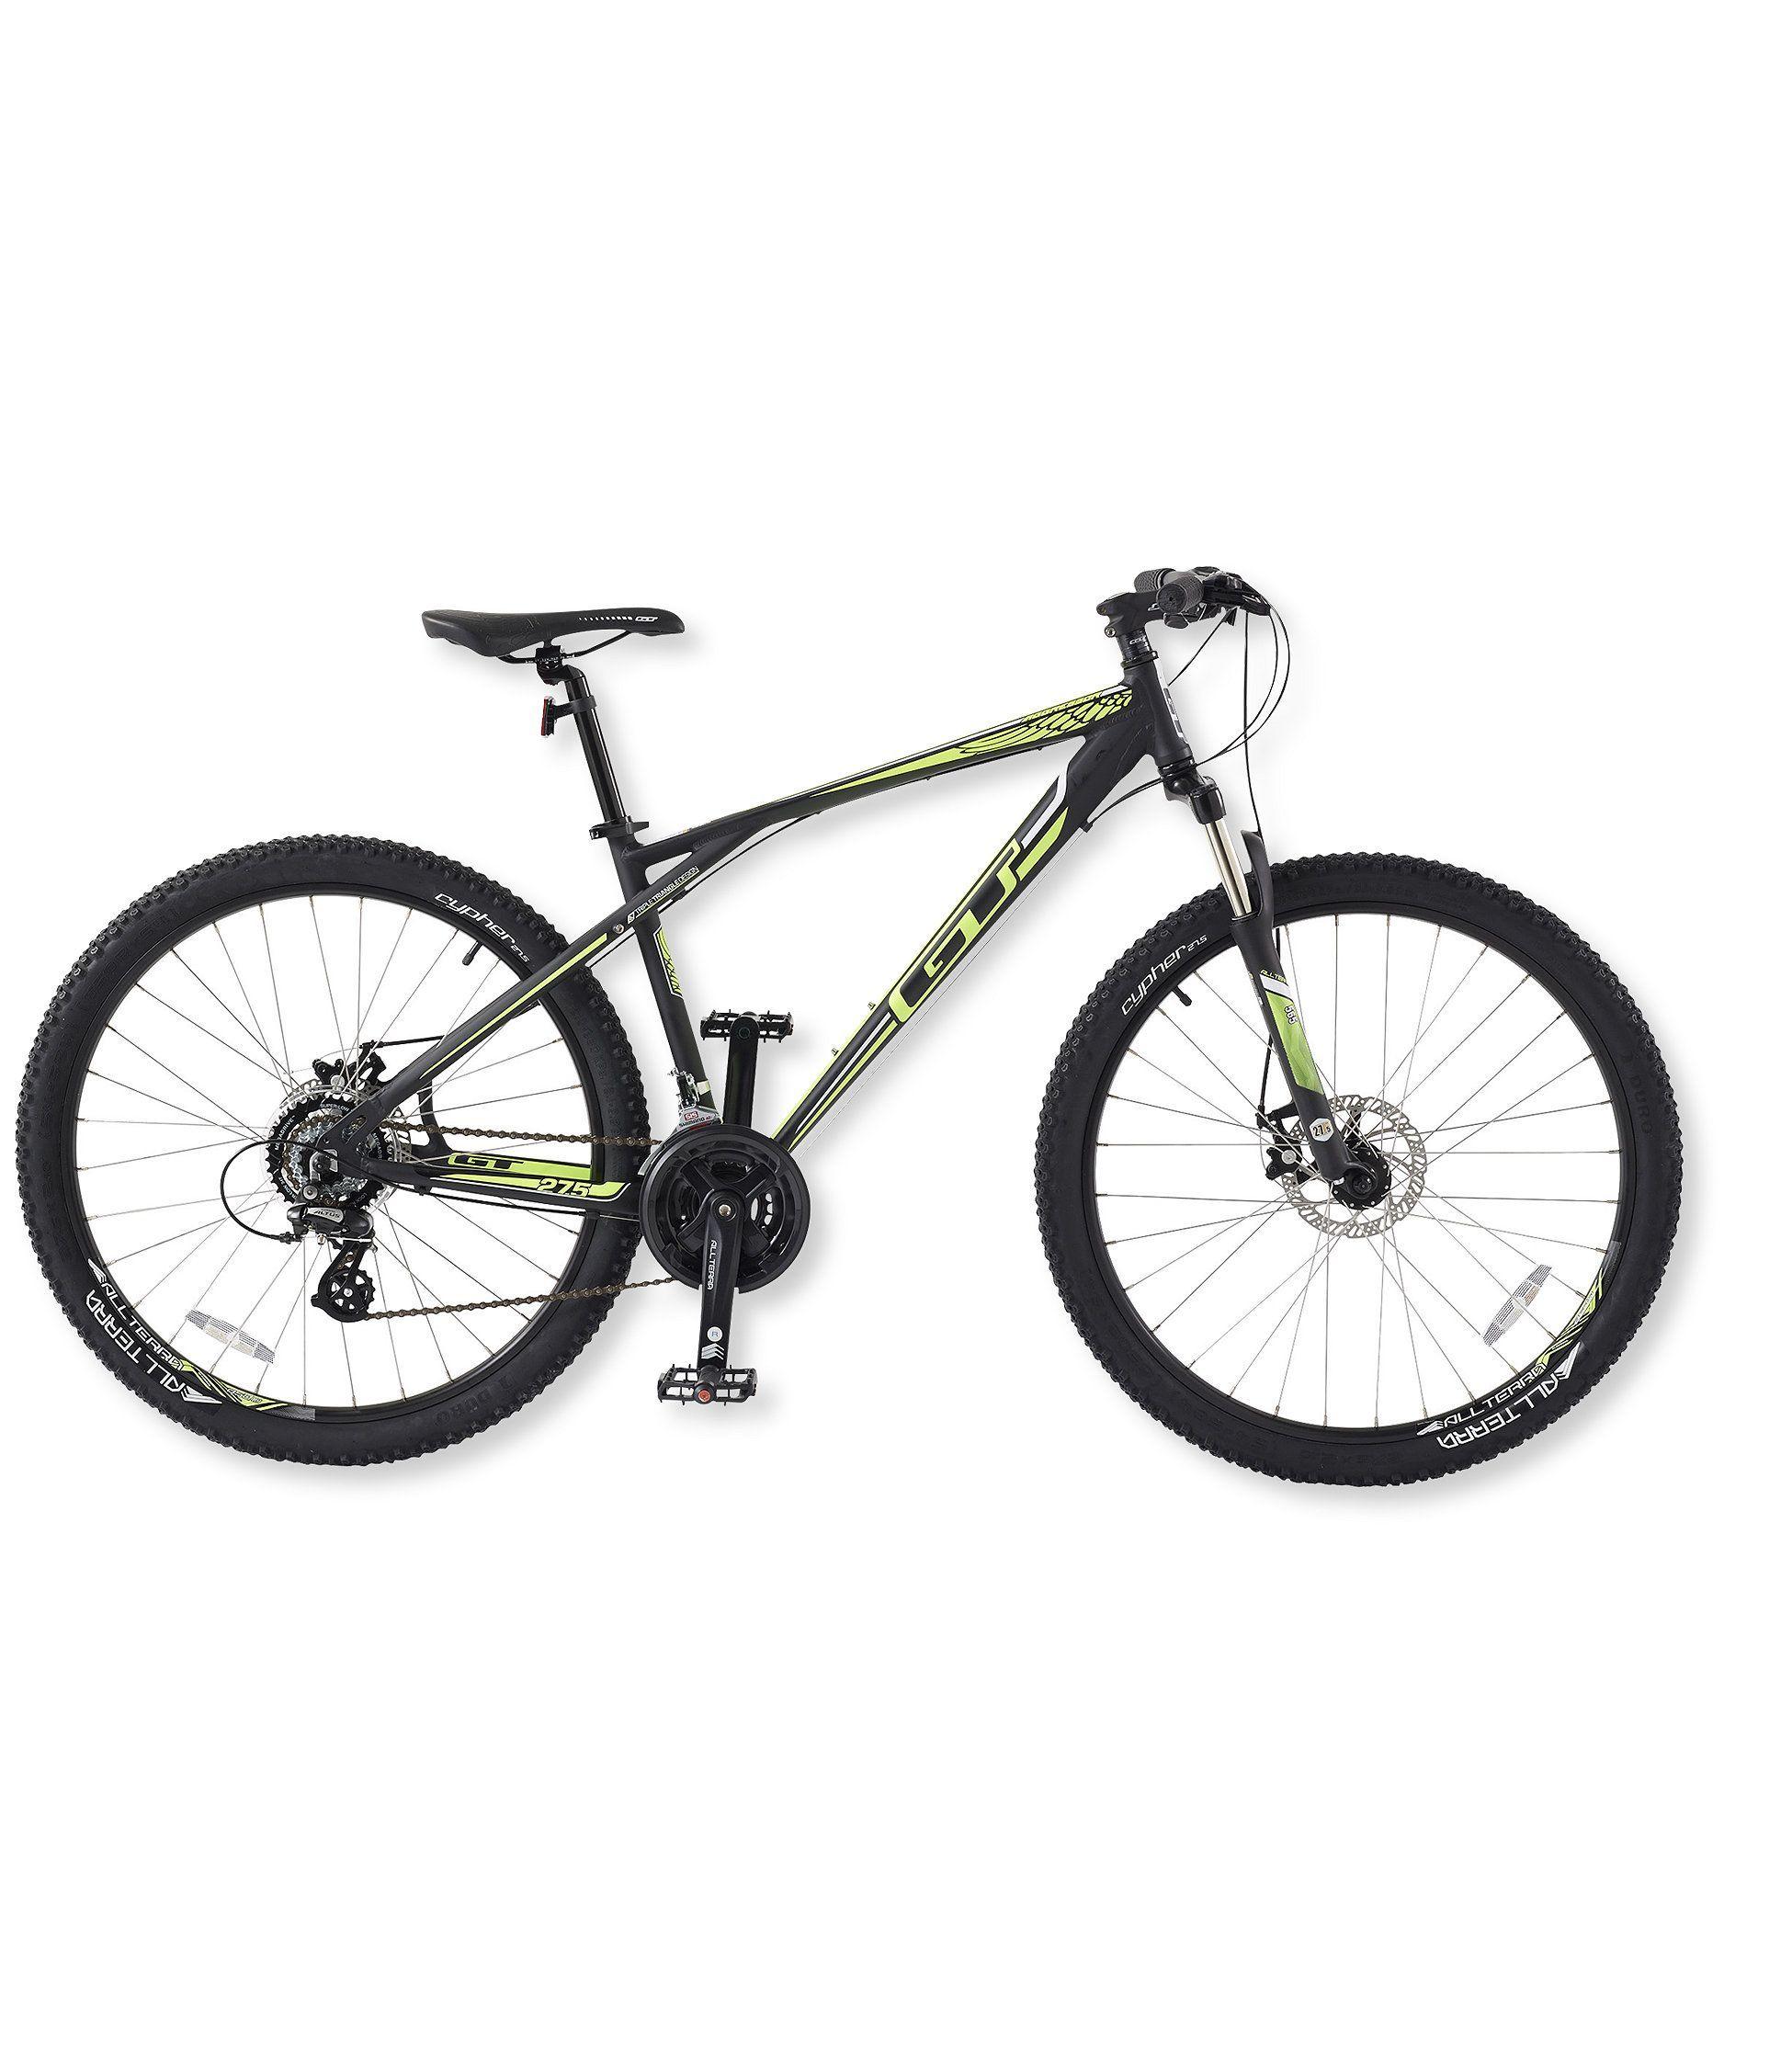 Men S Gt Aggressor Comp Mountain Bike 29er Mountain Bikes